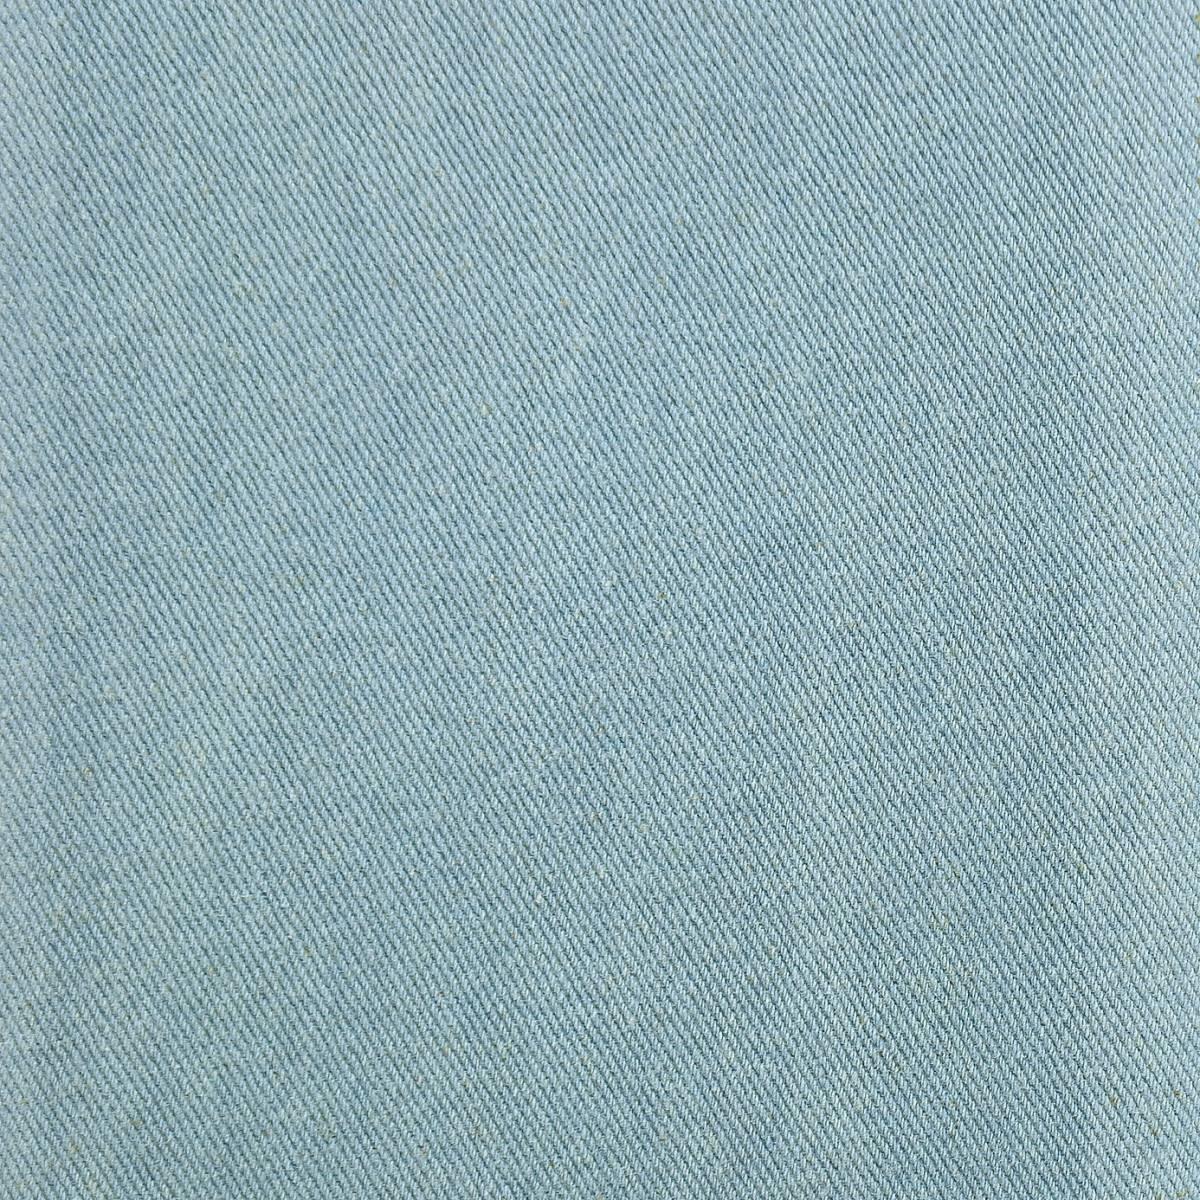 Birch Fabric Blue J863f 16 Jane Churchill Willow